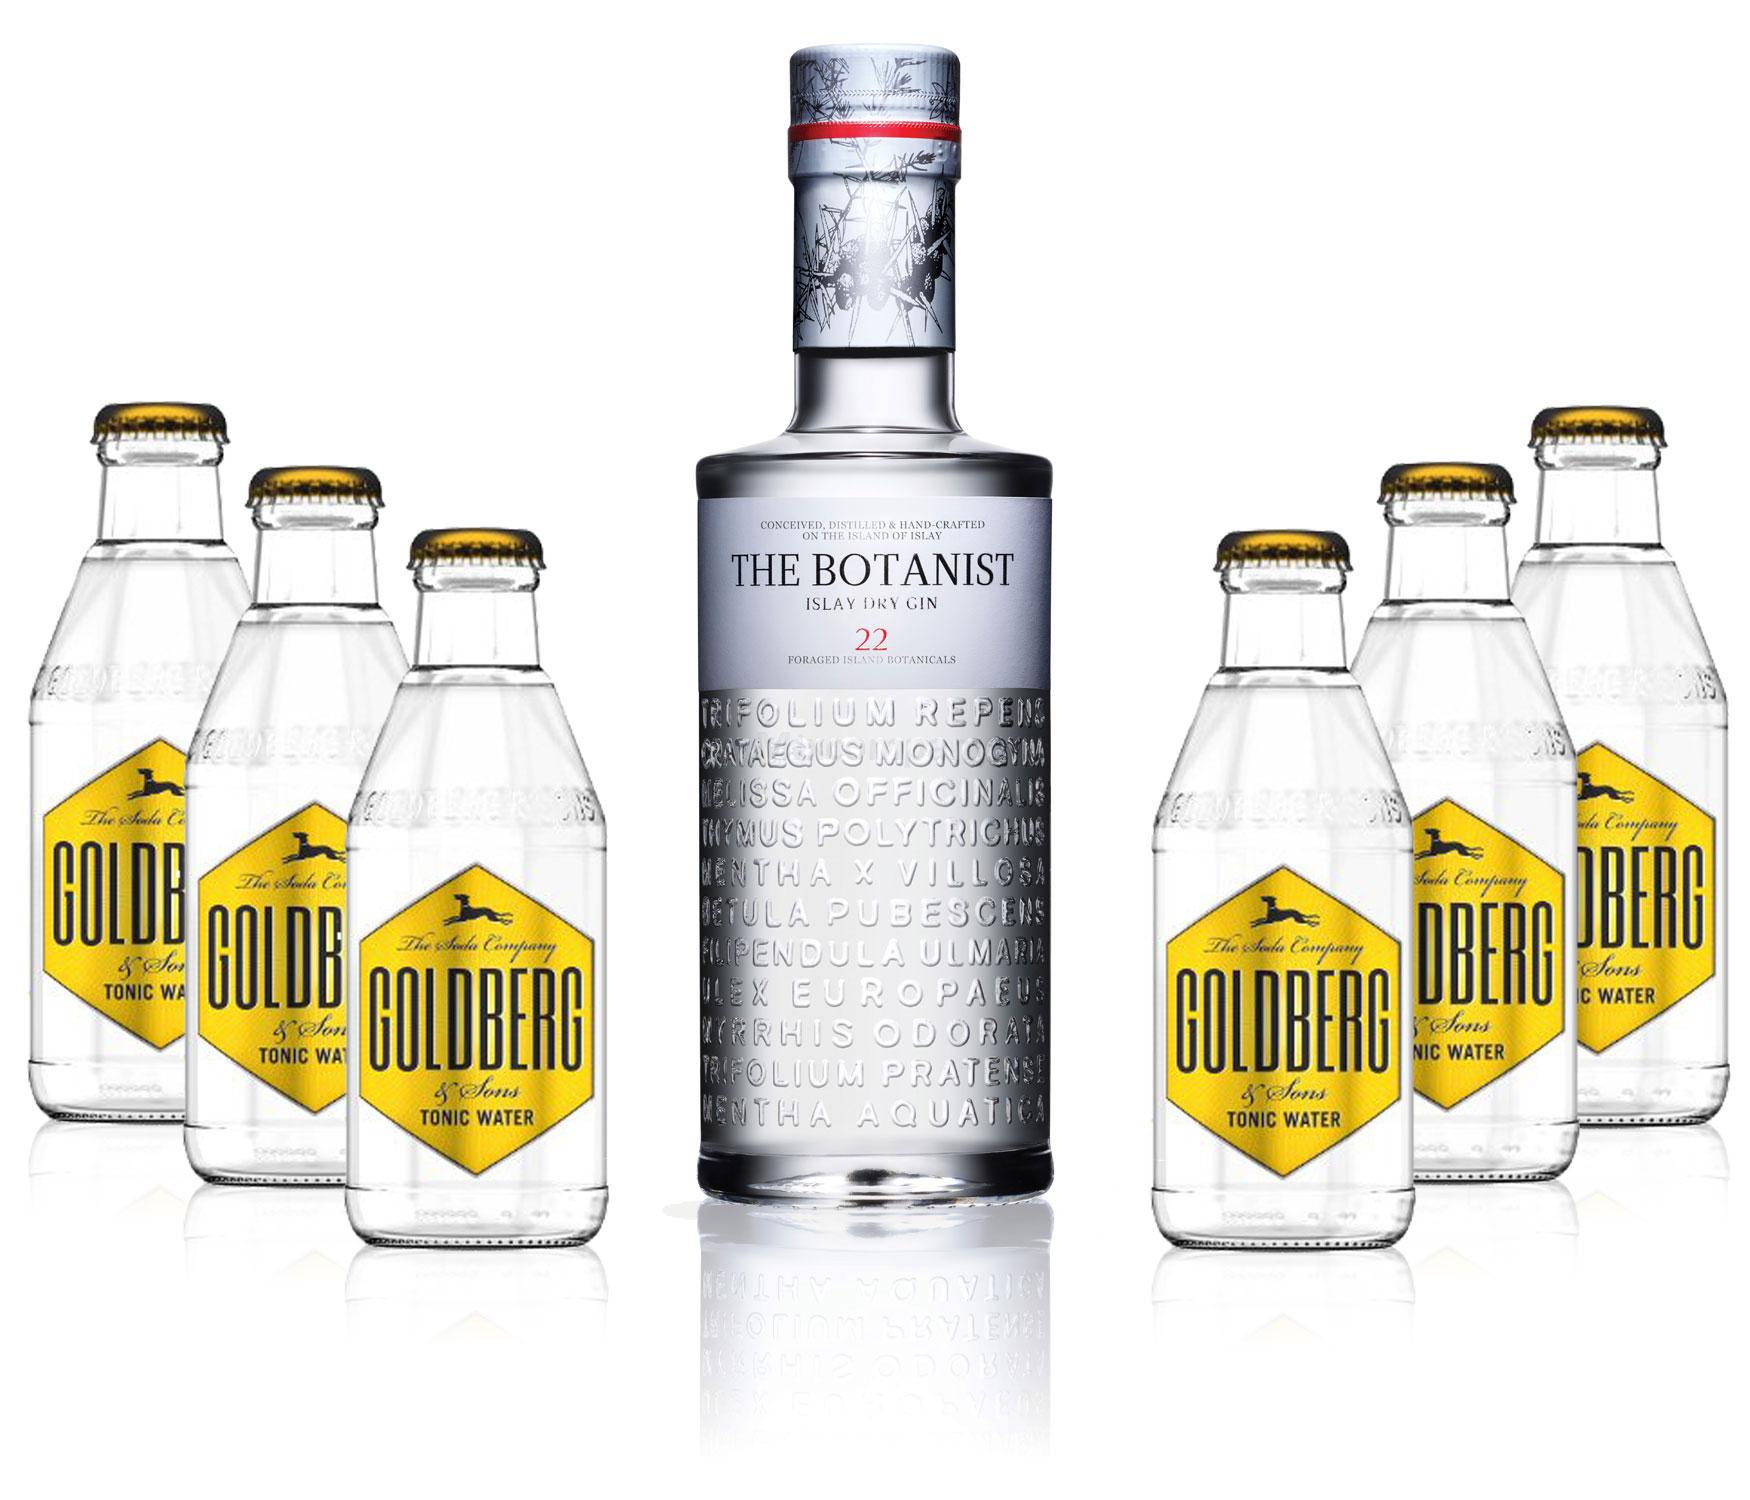 Gin Tonic Set - The Botanist Islay Dry Gin 0,7l 700ml (46% Vol) + 6x Goldberg Tonic Water 200ml inkl. Pfand MEHRWEG